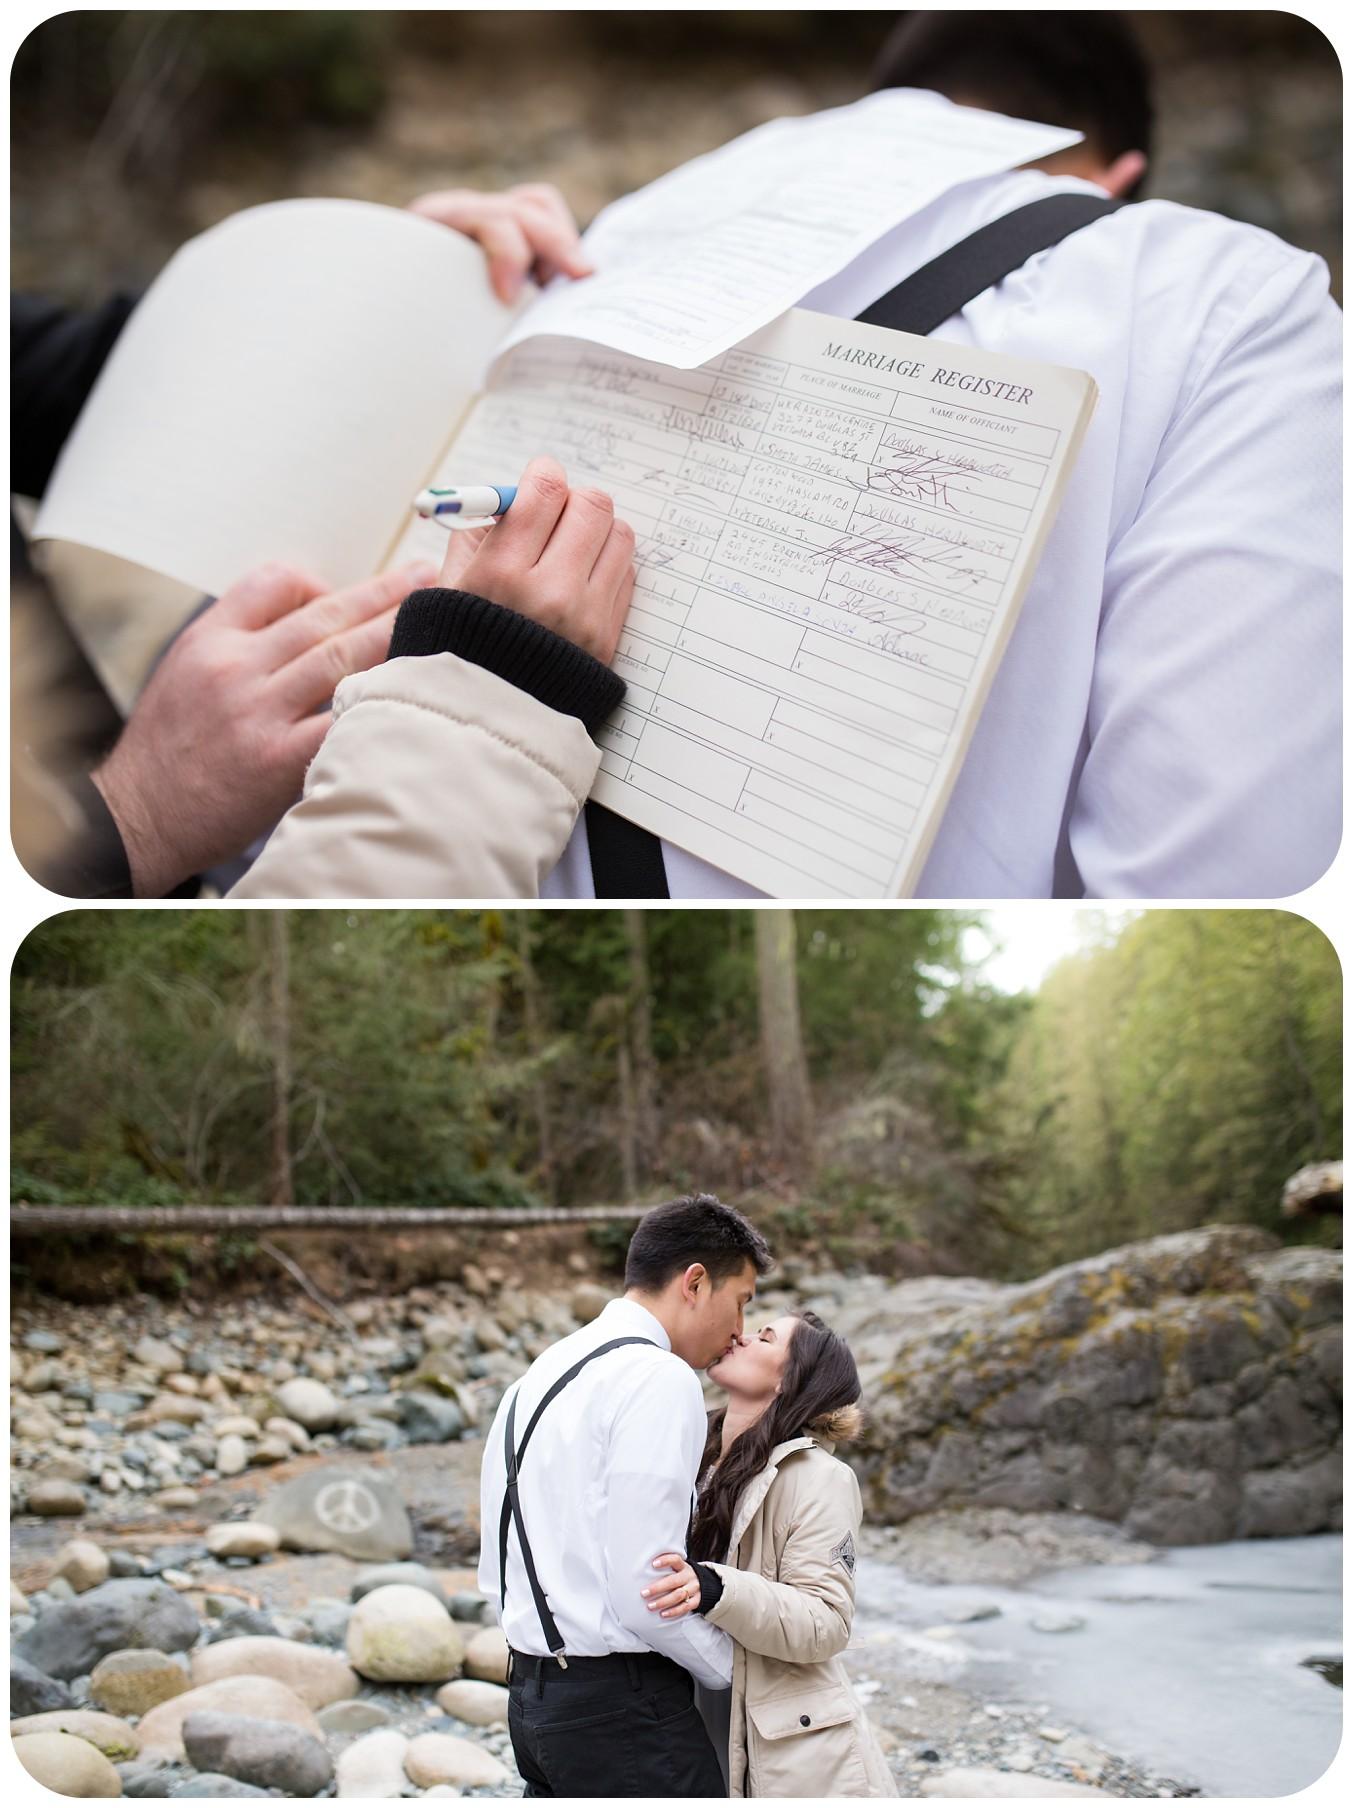 signing wedding register, outdoor riverside elopement, englishman river falls weddings, englishman river falls wedding photographer